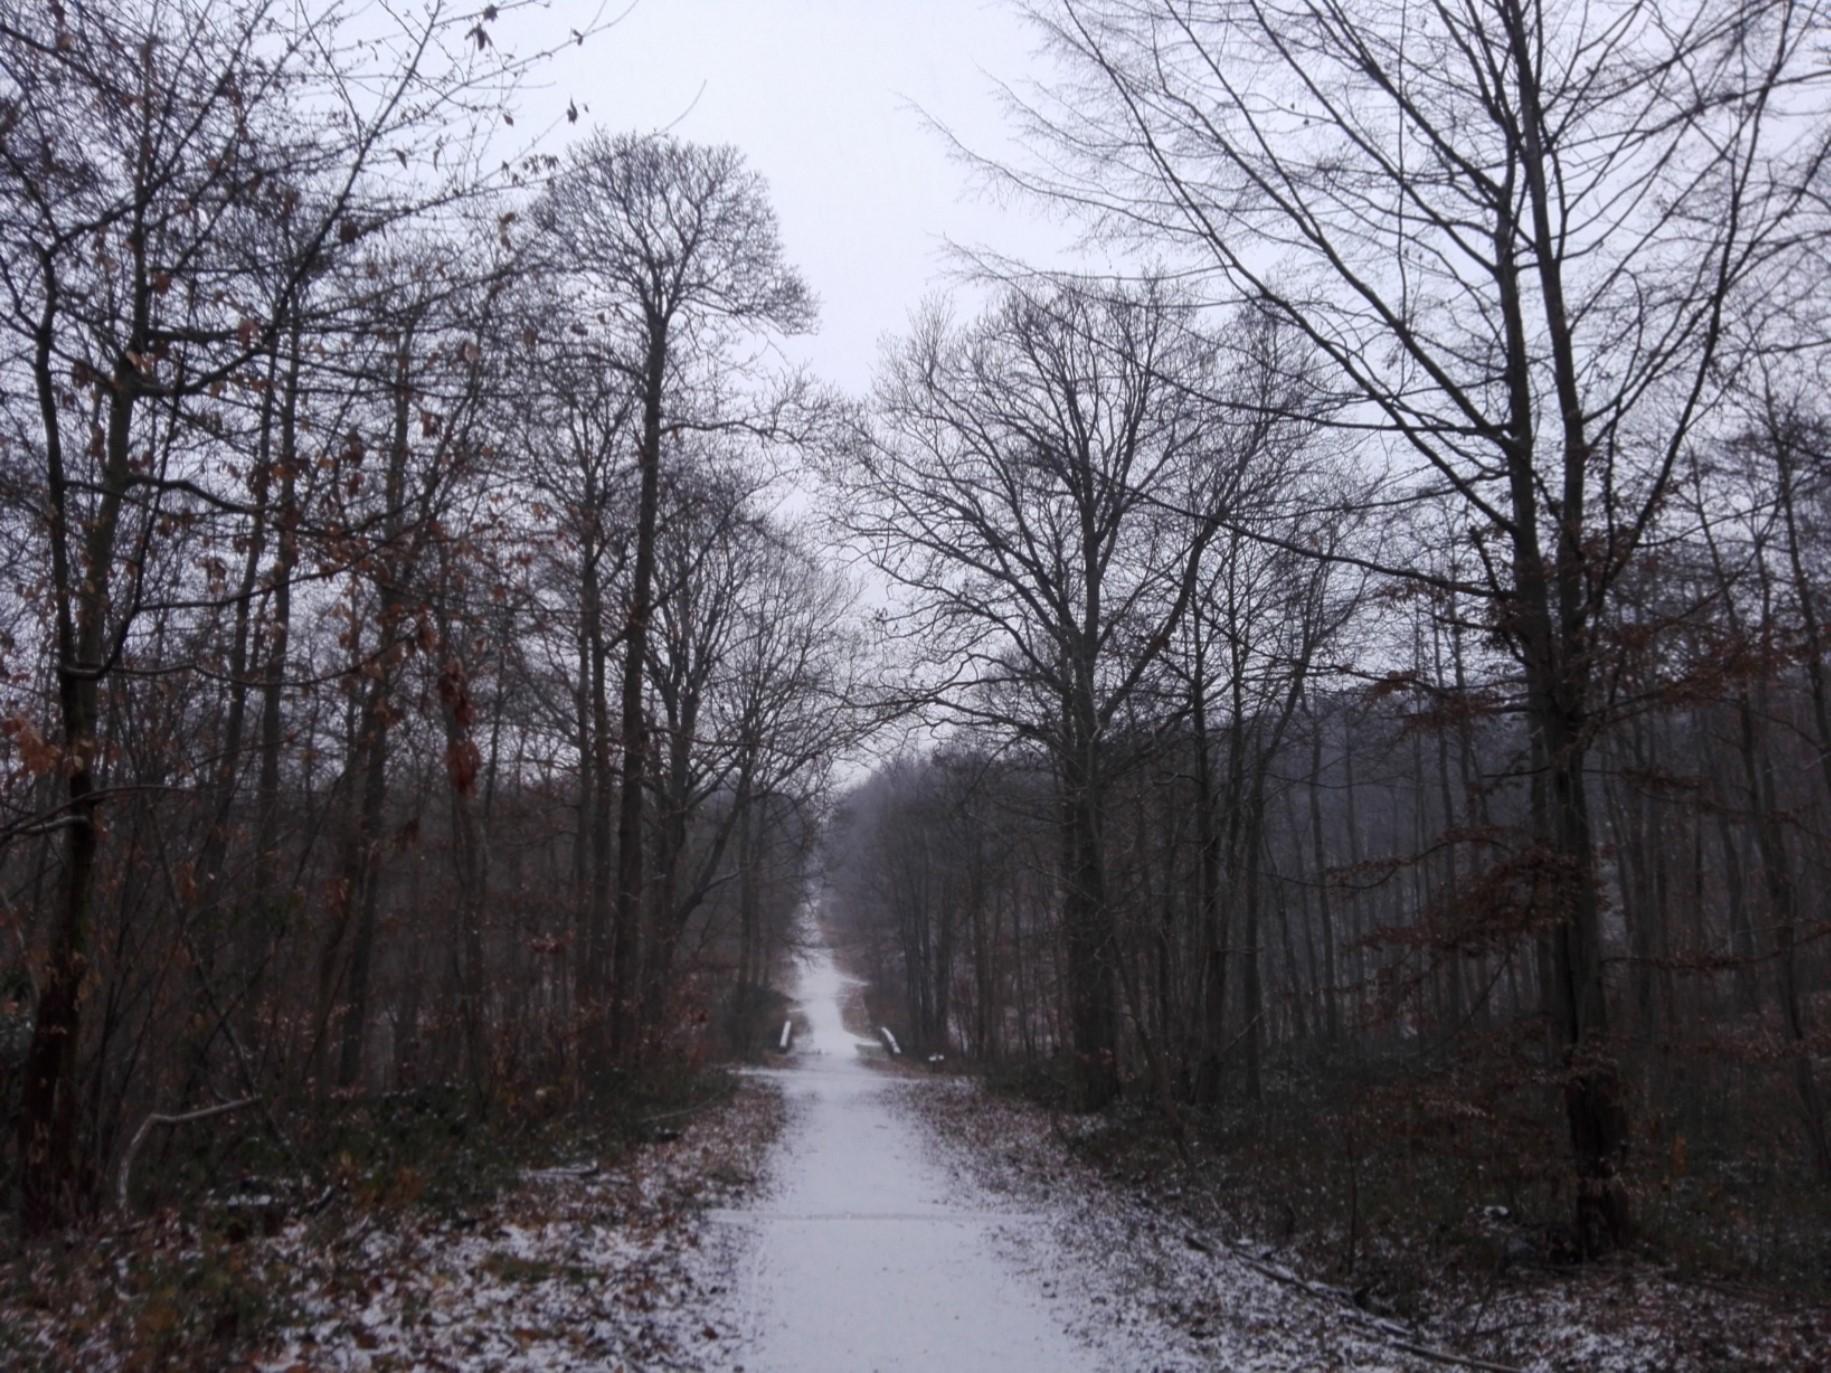 Janvier 2019 - Episode neigeux dans la Forêt de Montmorency (photo Tanja Kiorboe)